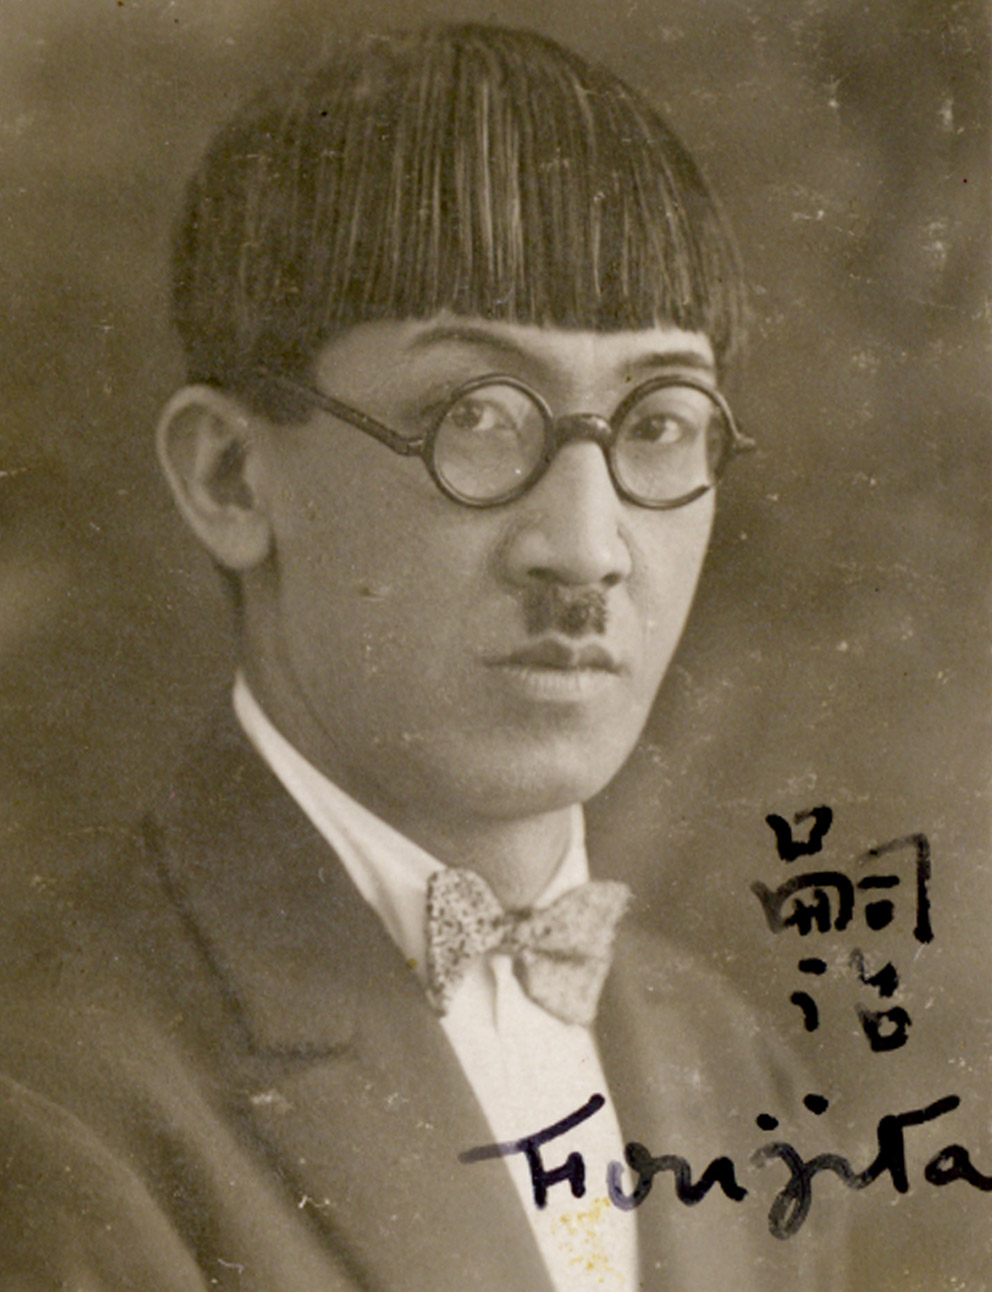 嗣治 Foujita 1922